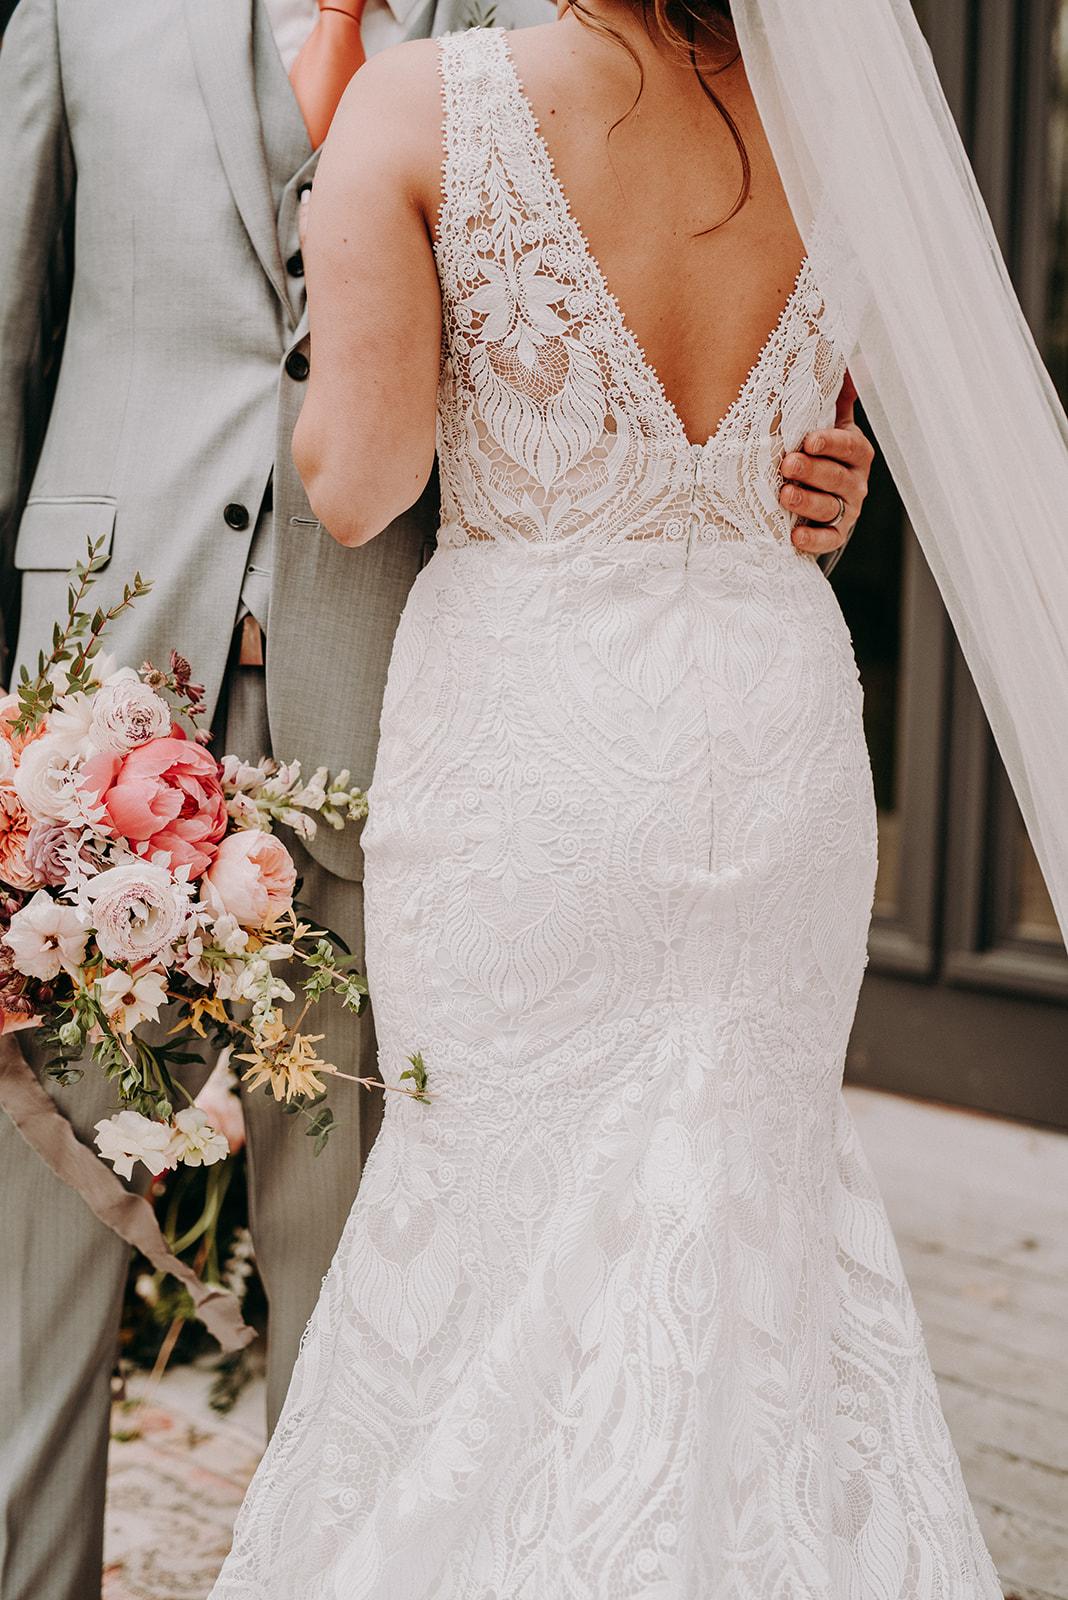 Bride Dress Details.jpg